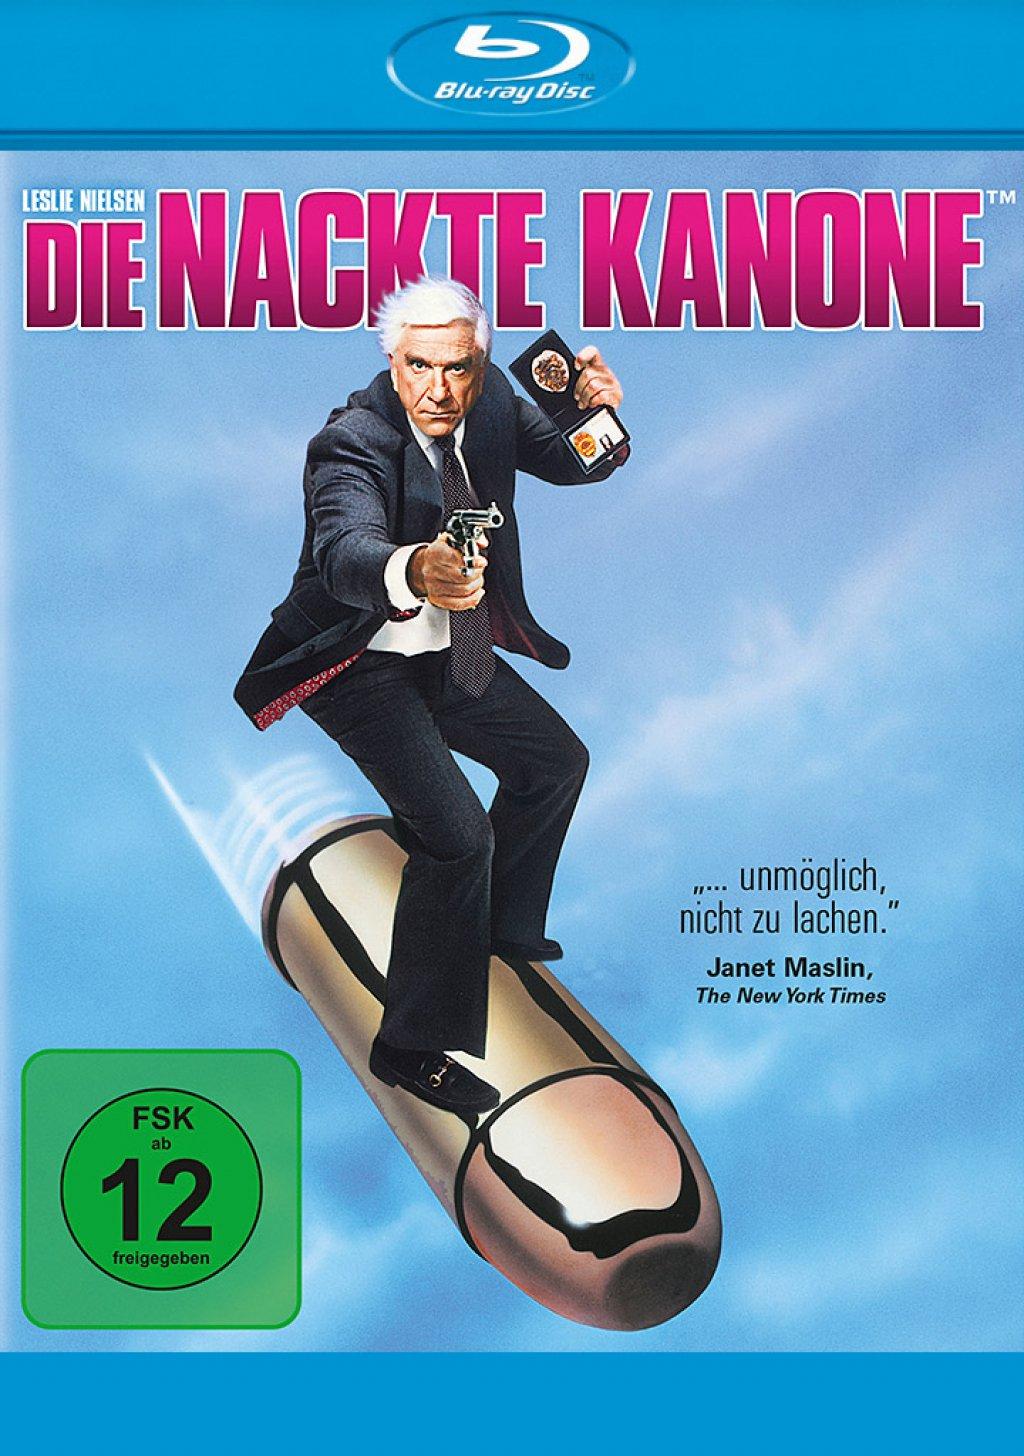 Die Nackte Kanone (Blu-ray)